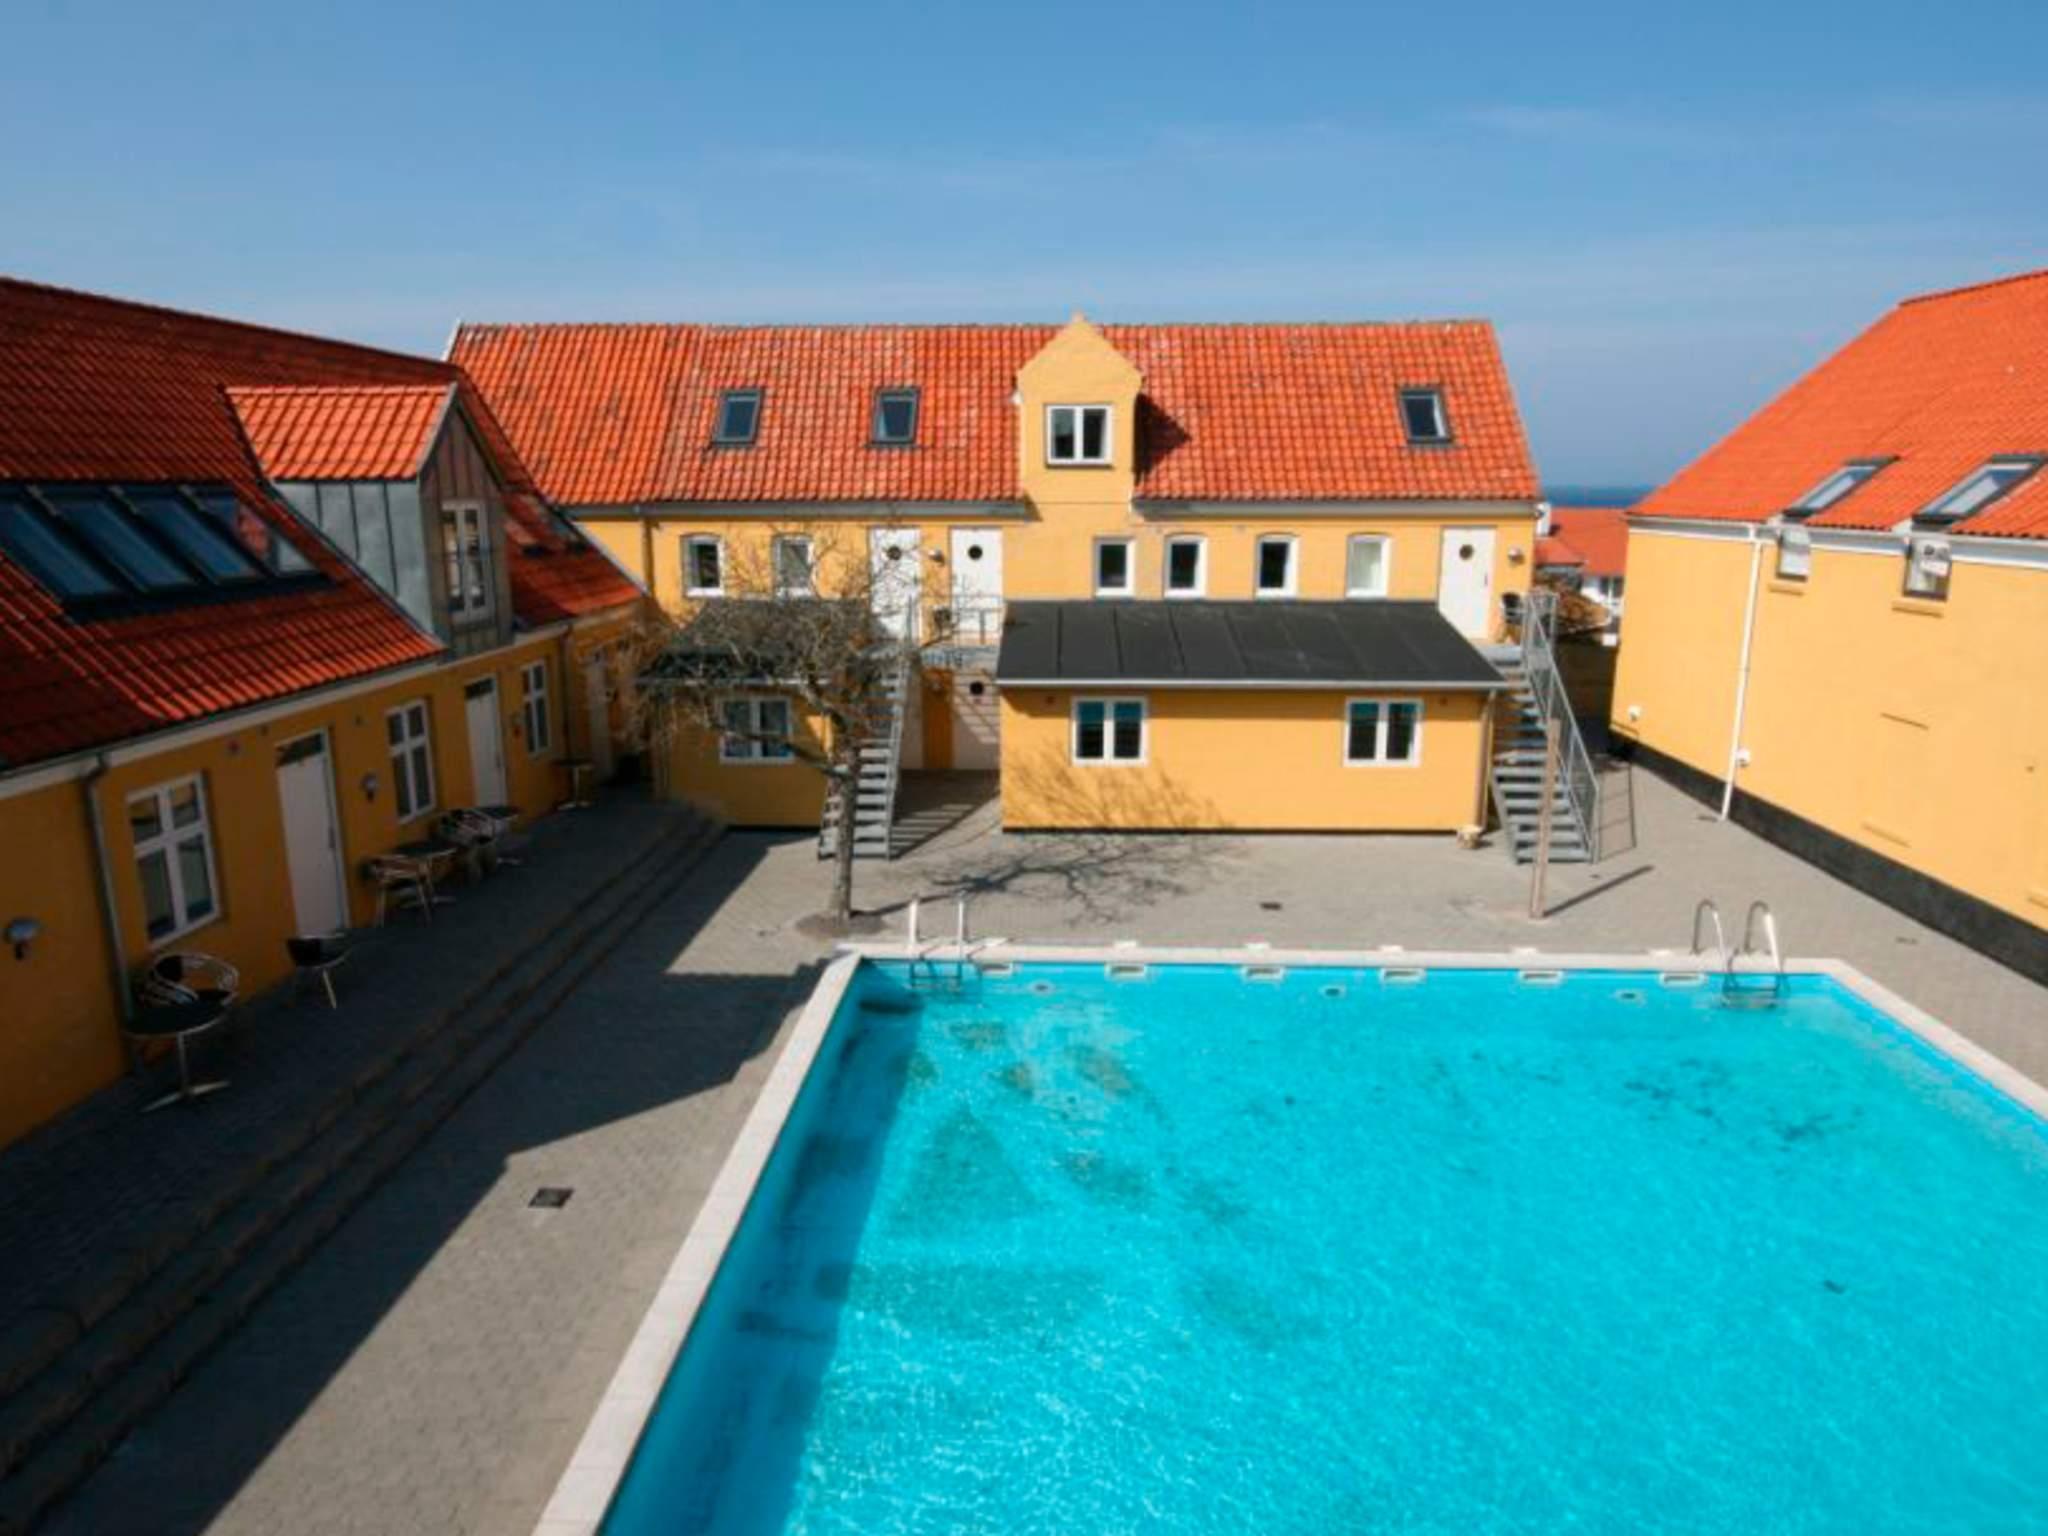 Ferienwohnung Gudhjem (135425), Gudhjem, , Bornholm, Dänemark, Bild 14